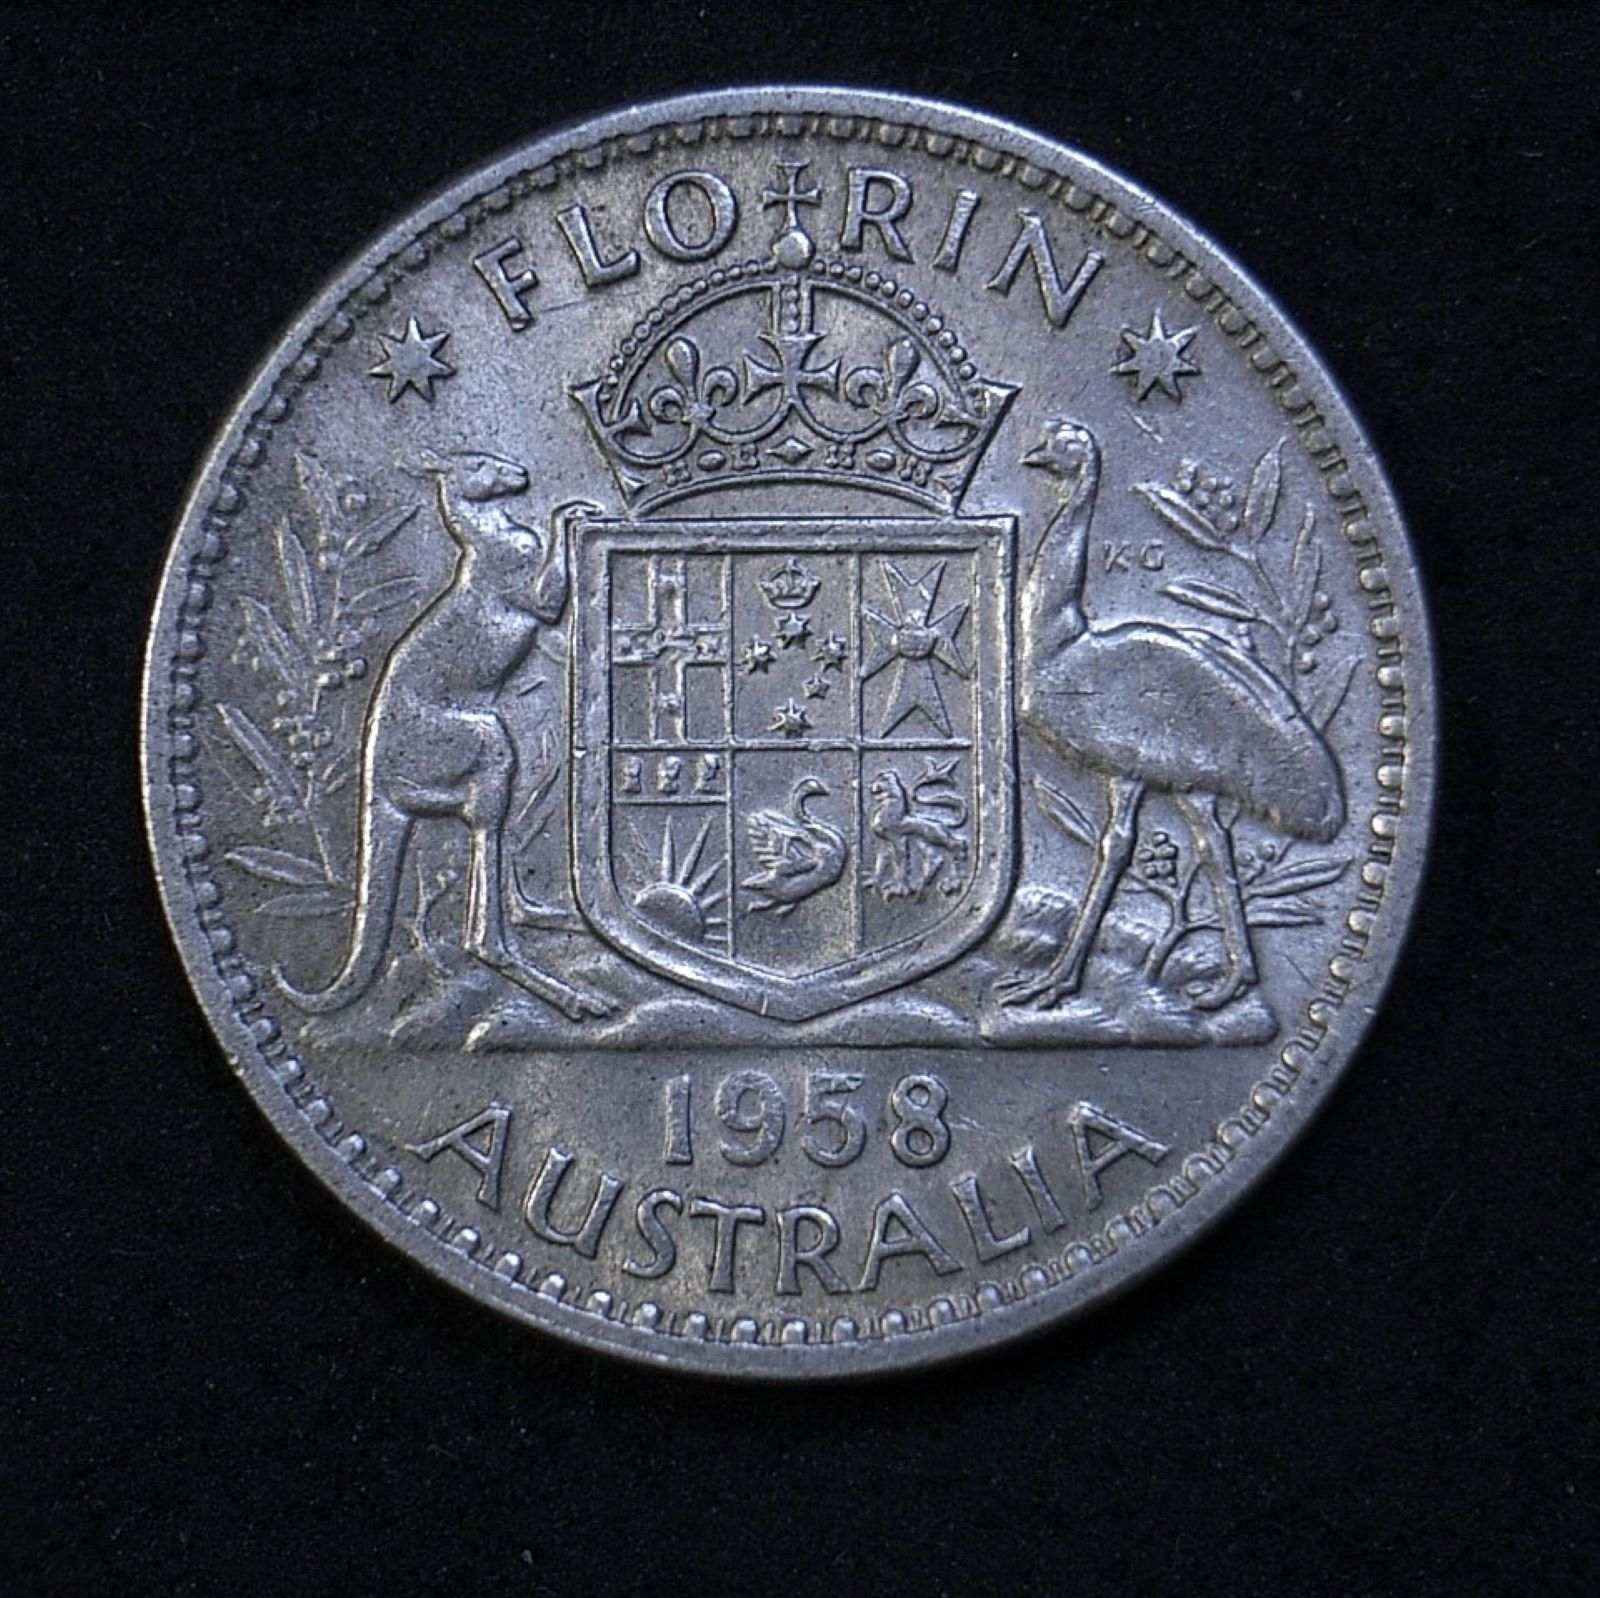 Aus Florin 1958 rev 1